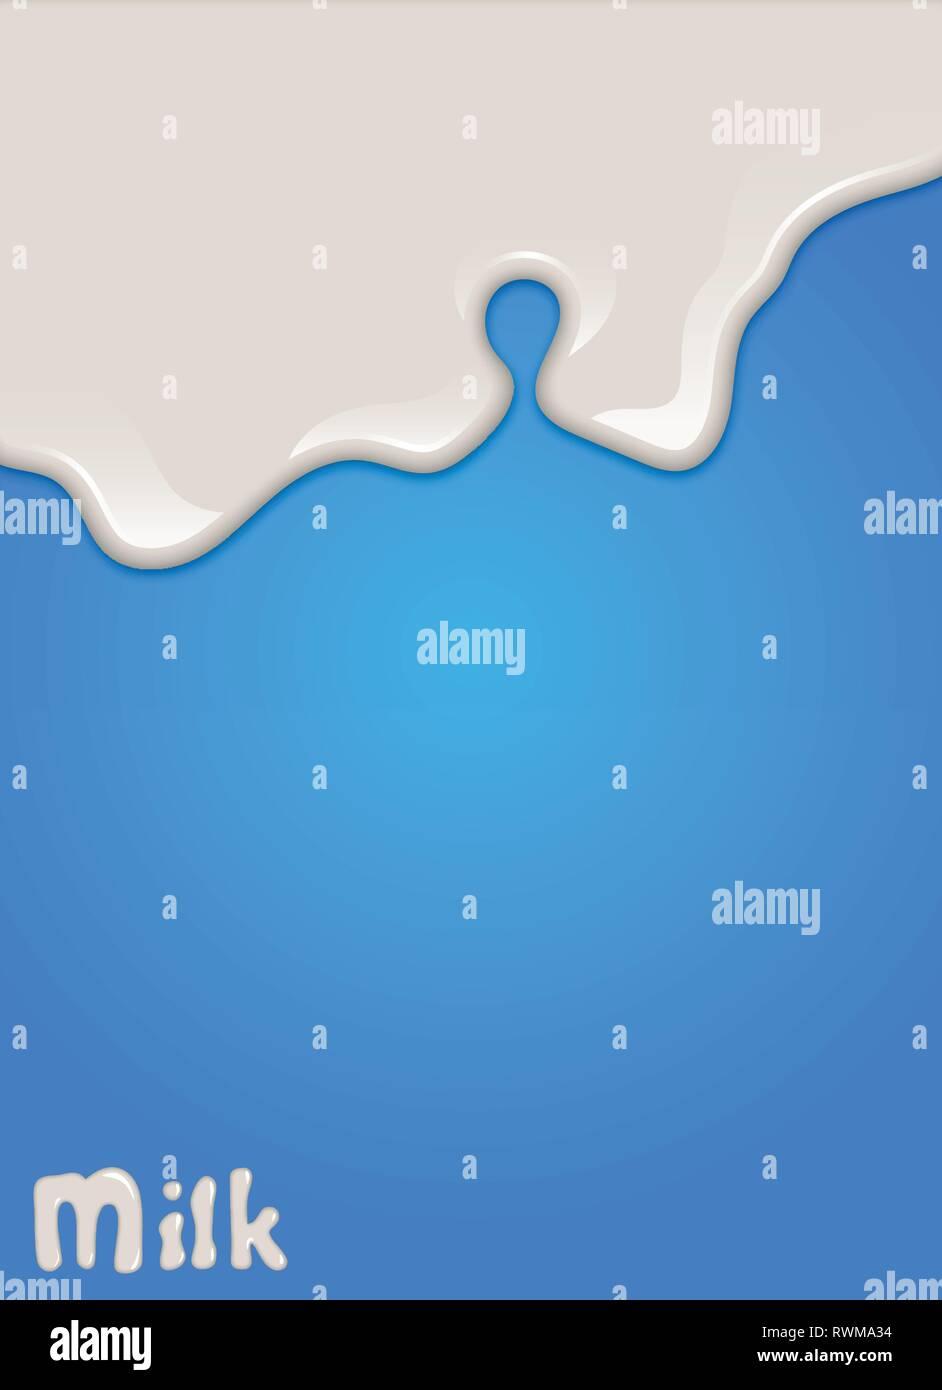 Realistic milk drop, splashes, liquid isolated on blue background